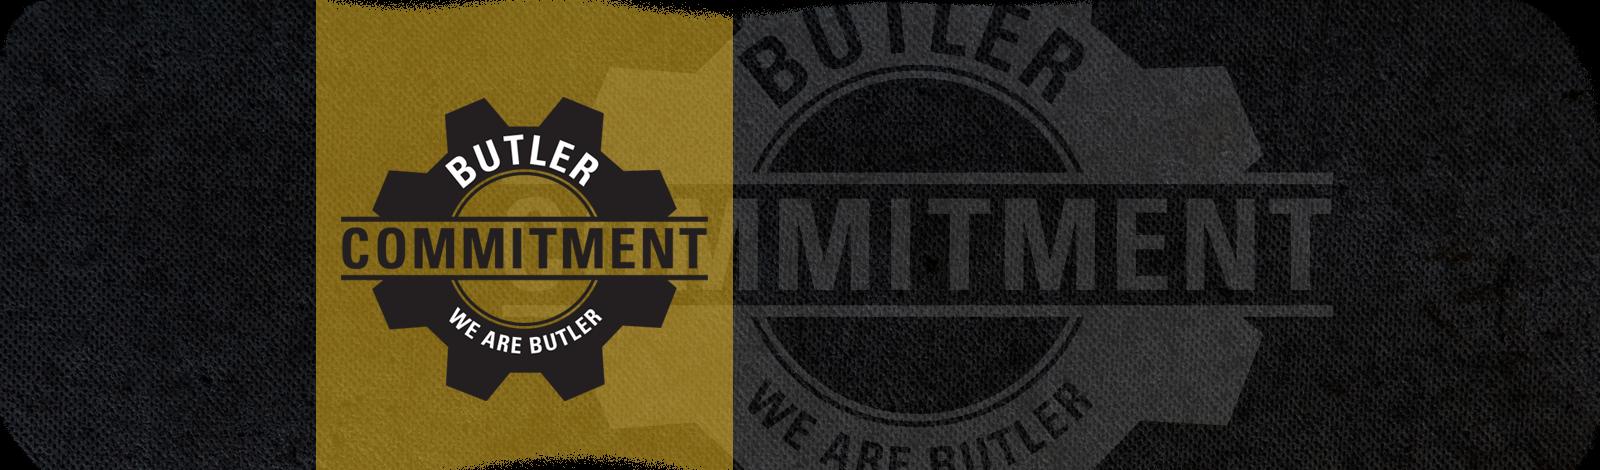 butlercommitment2